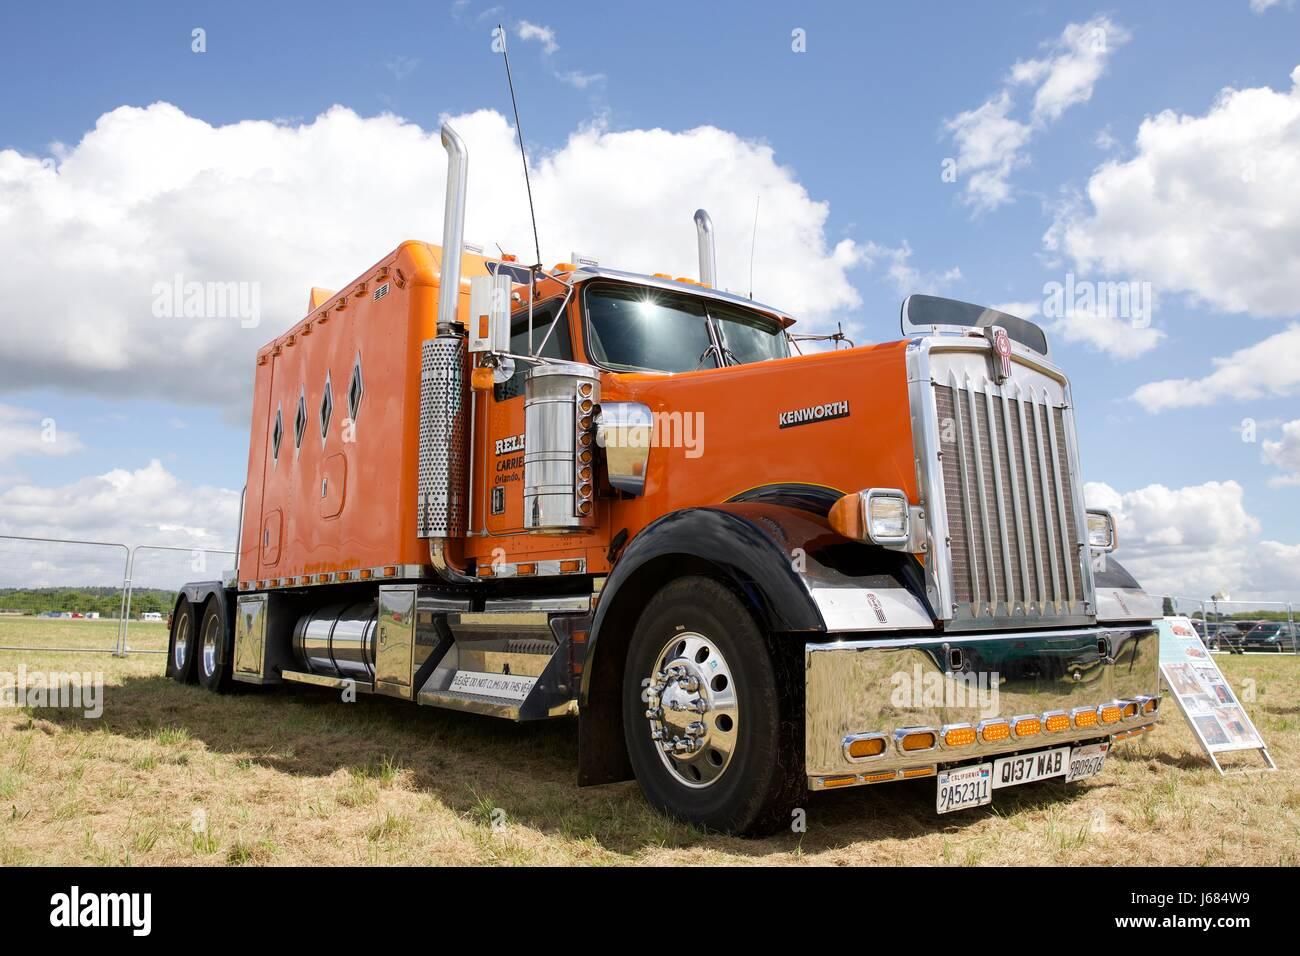 Kenworth Truck - Stock Image